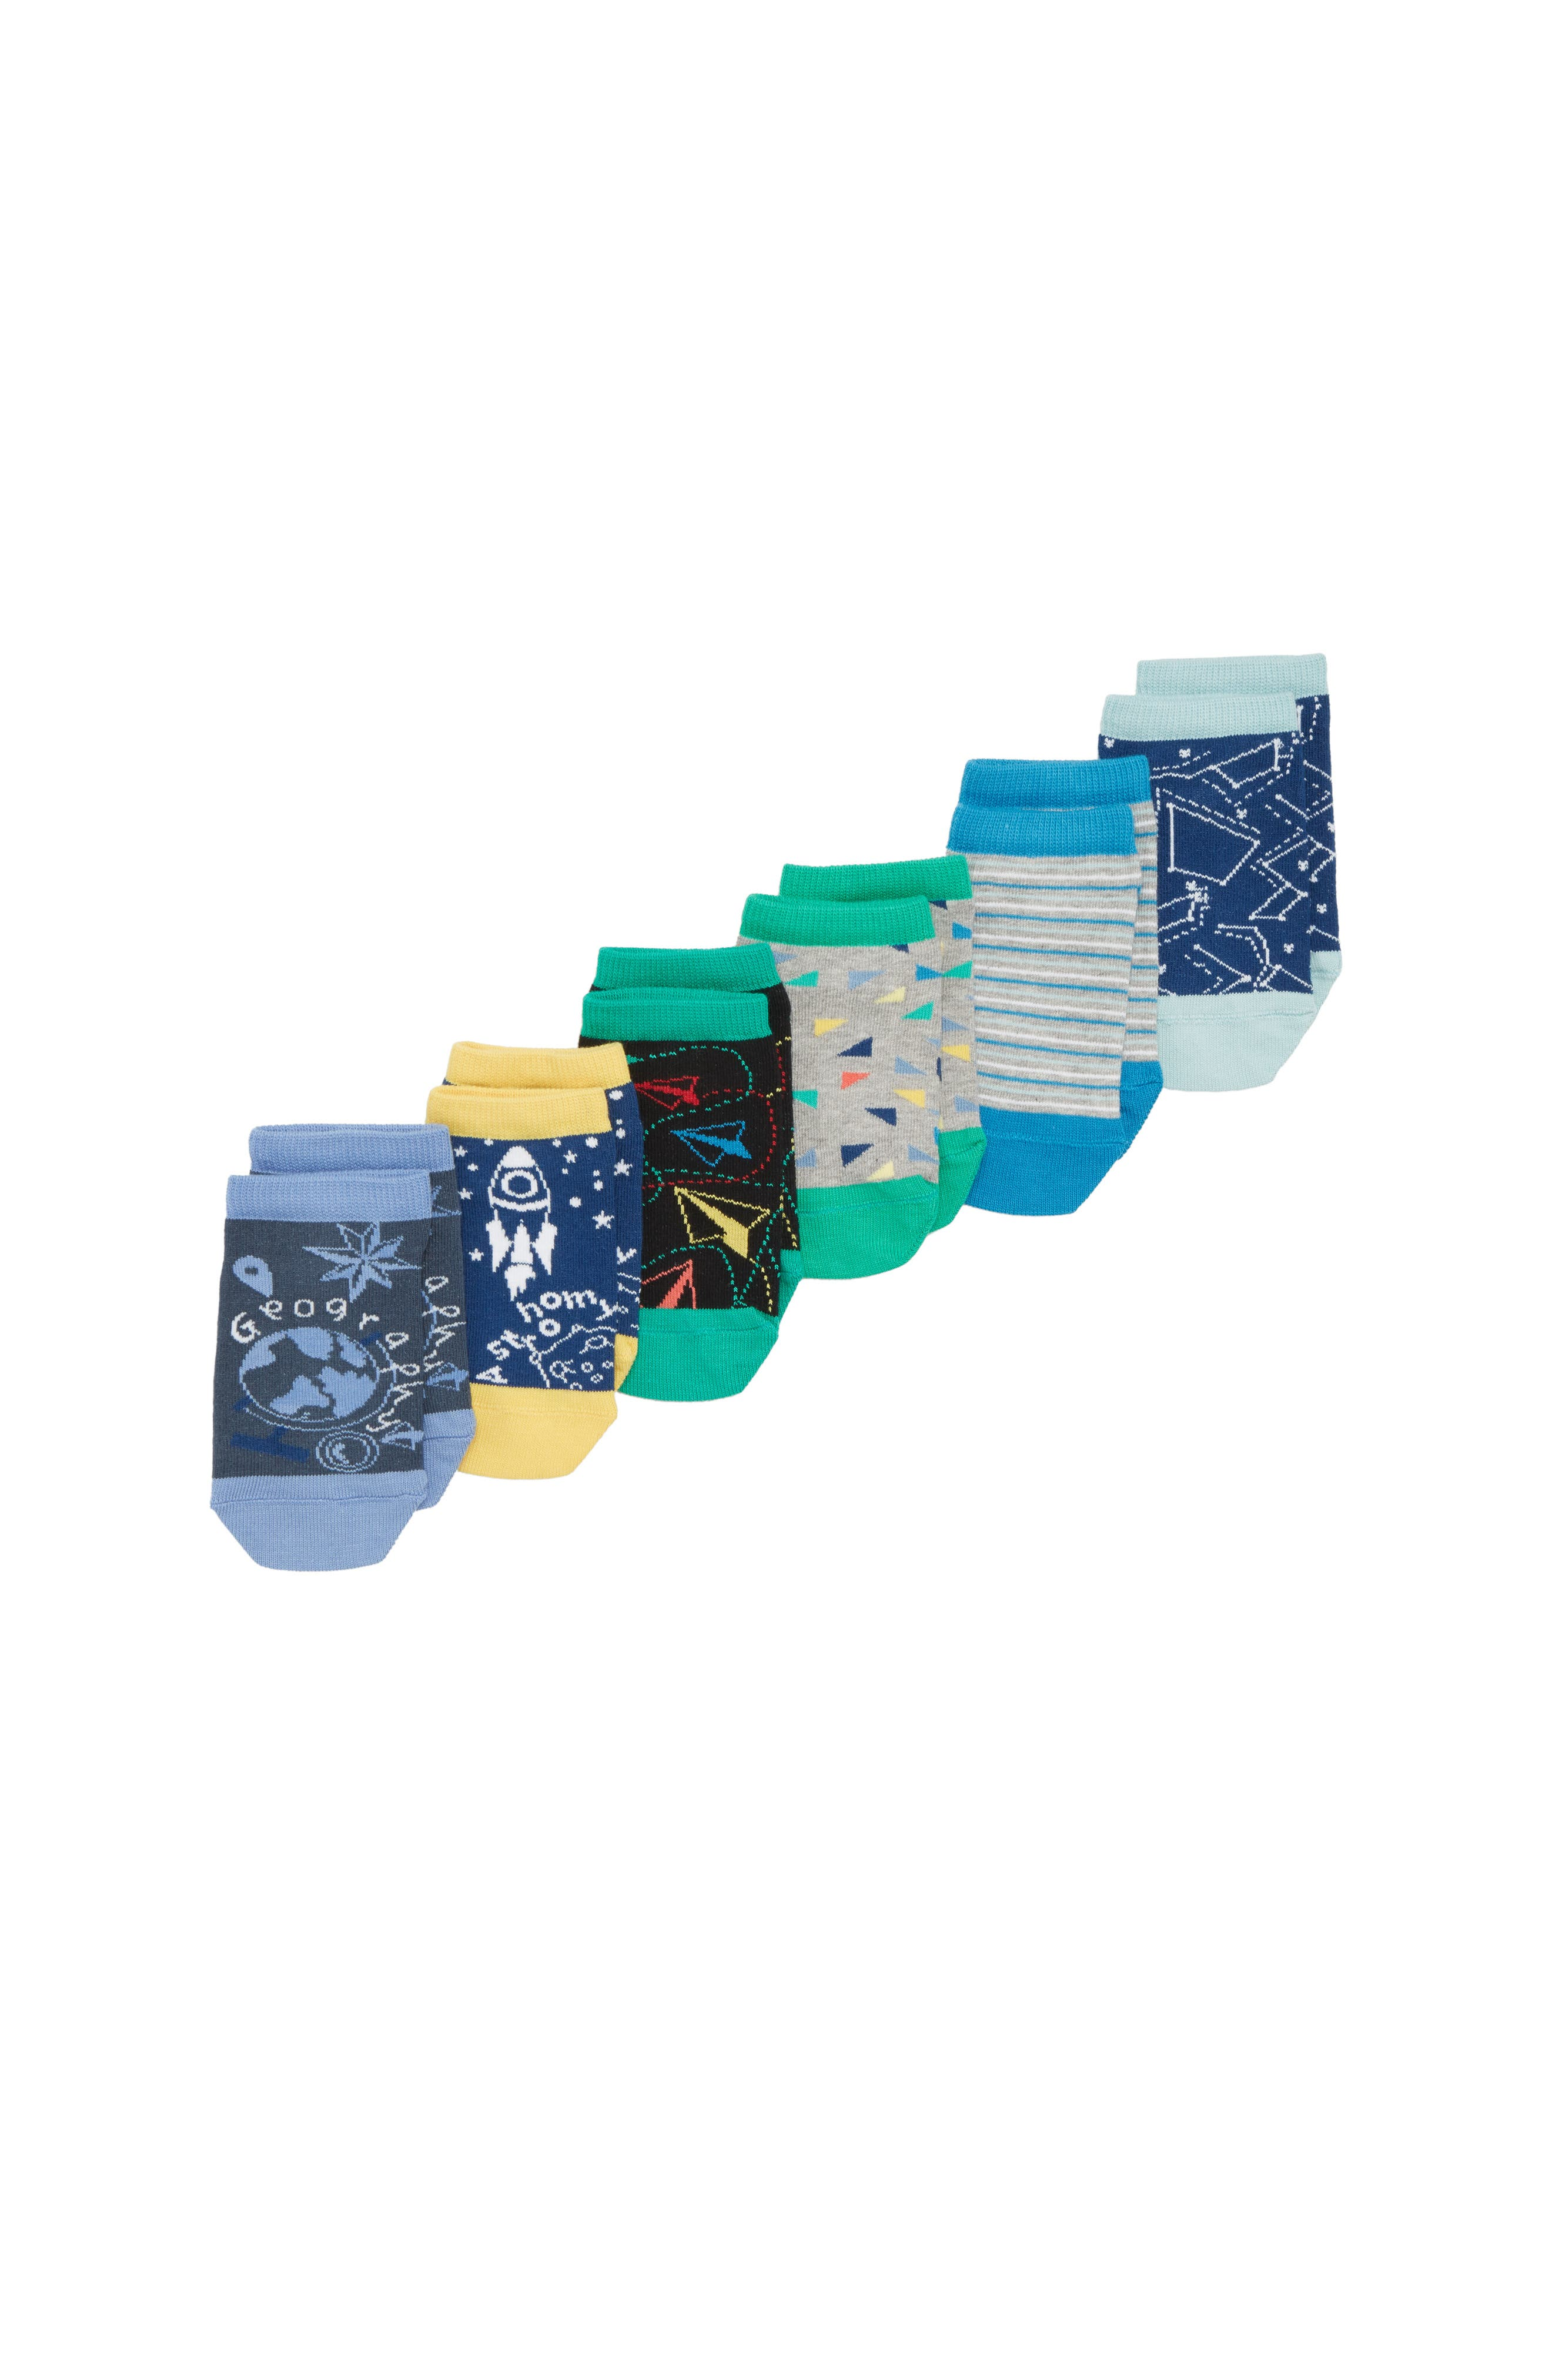 6-Pack Geography Low-Cut Socks,                             Main thumbnail 1, color,                             701